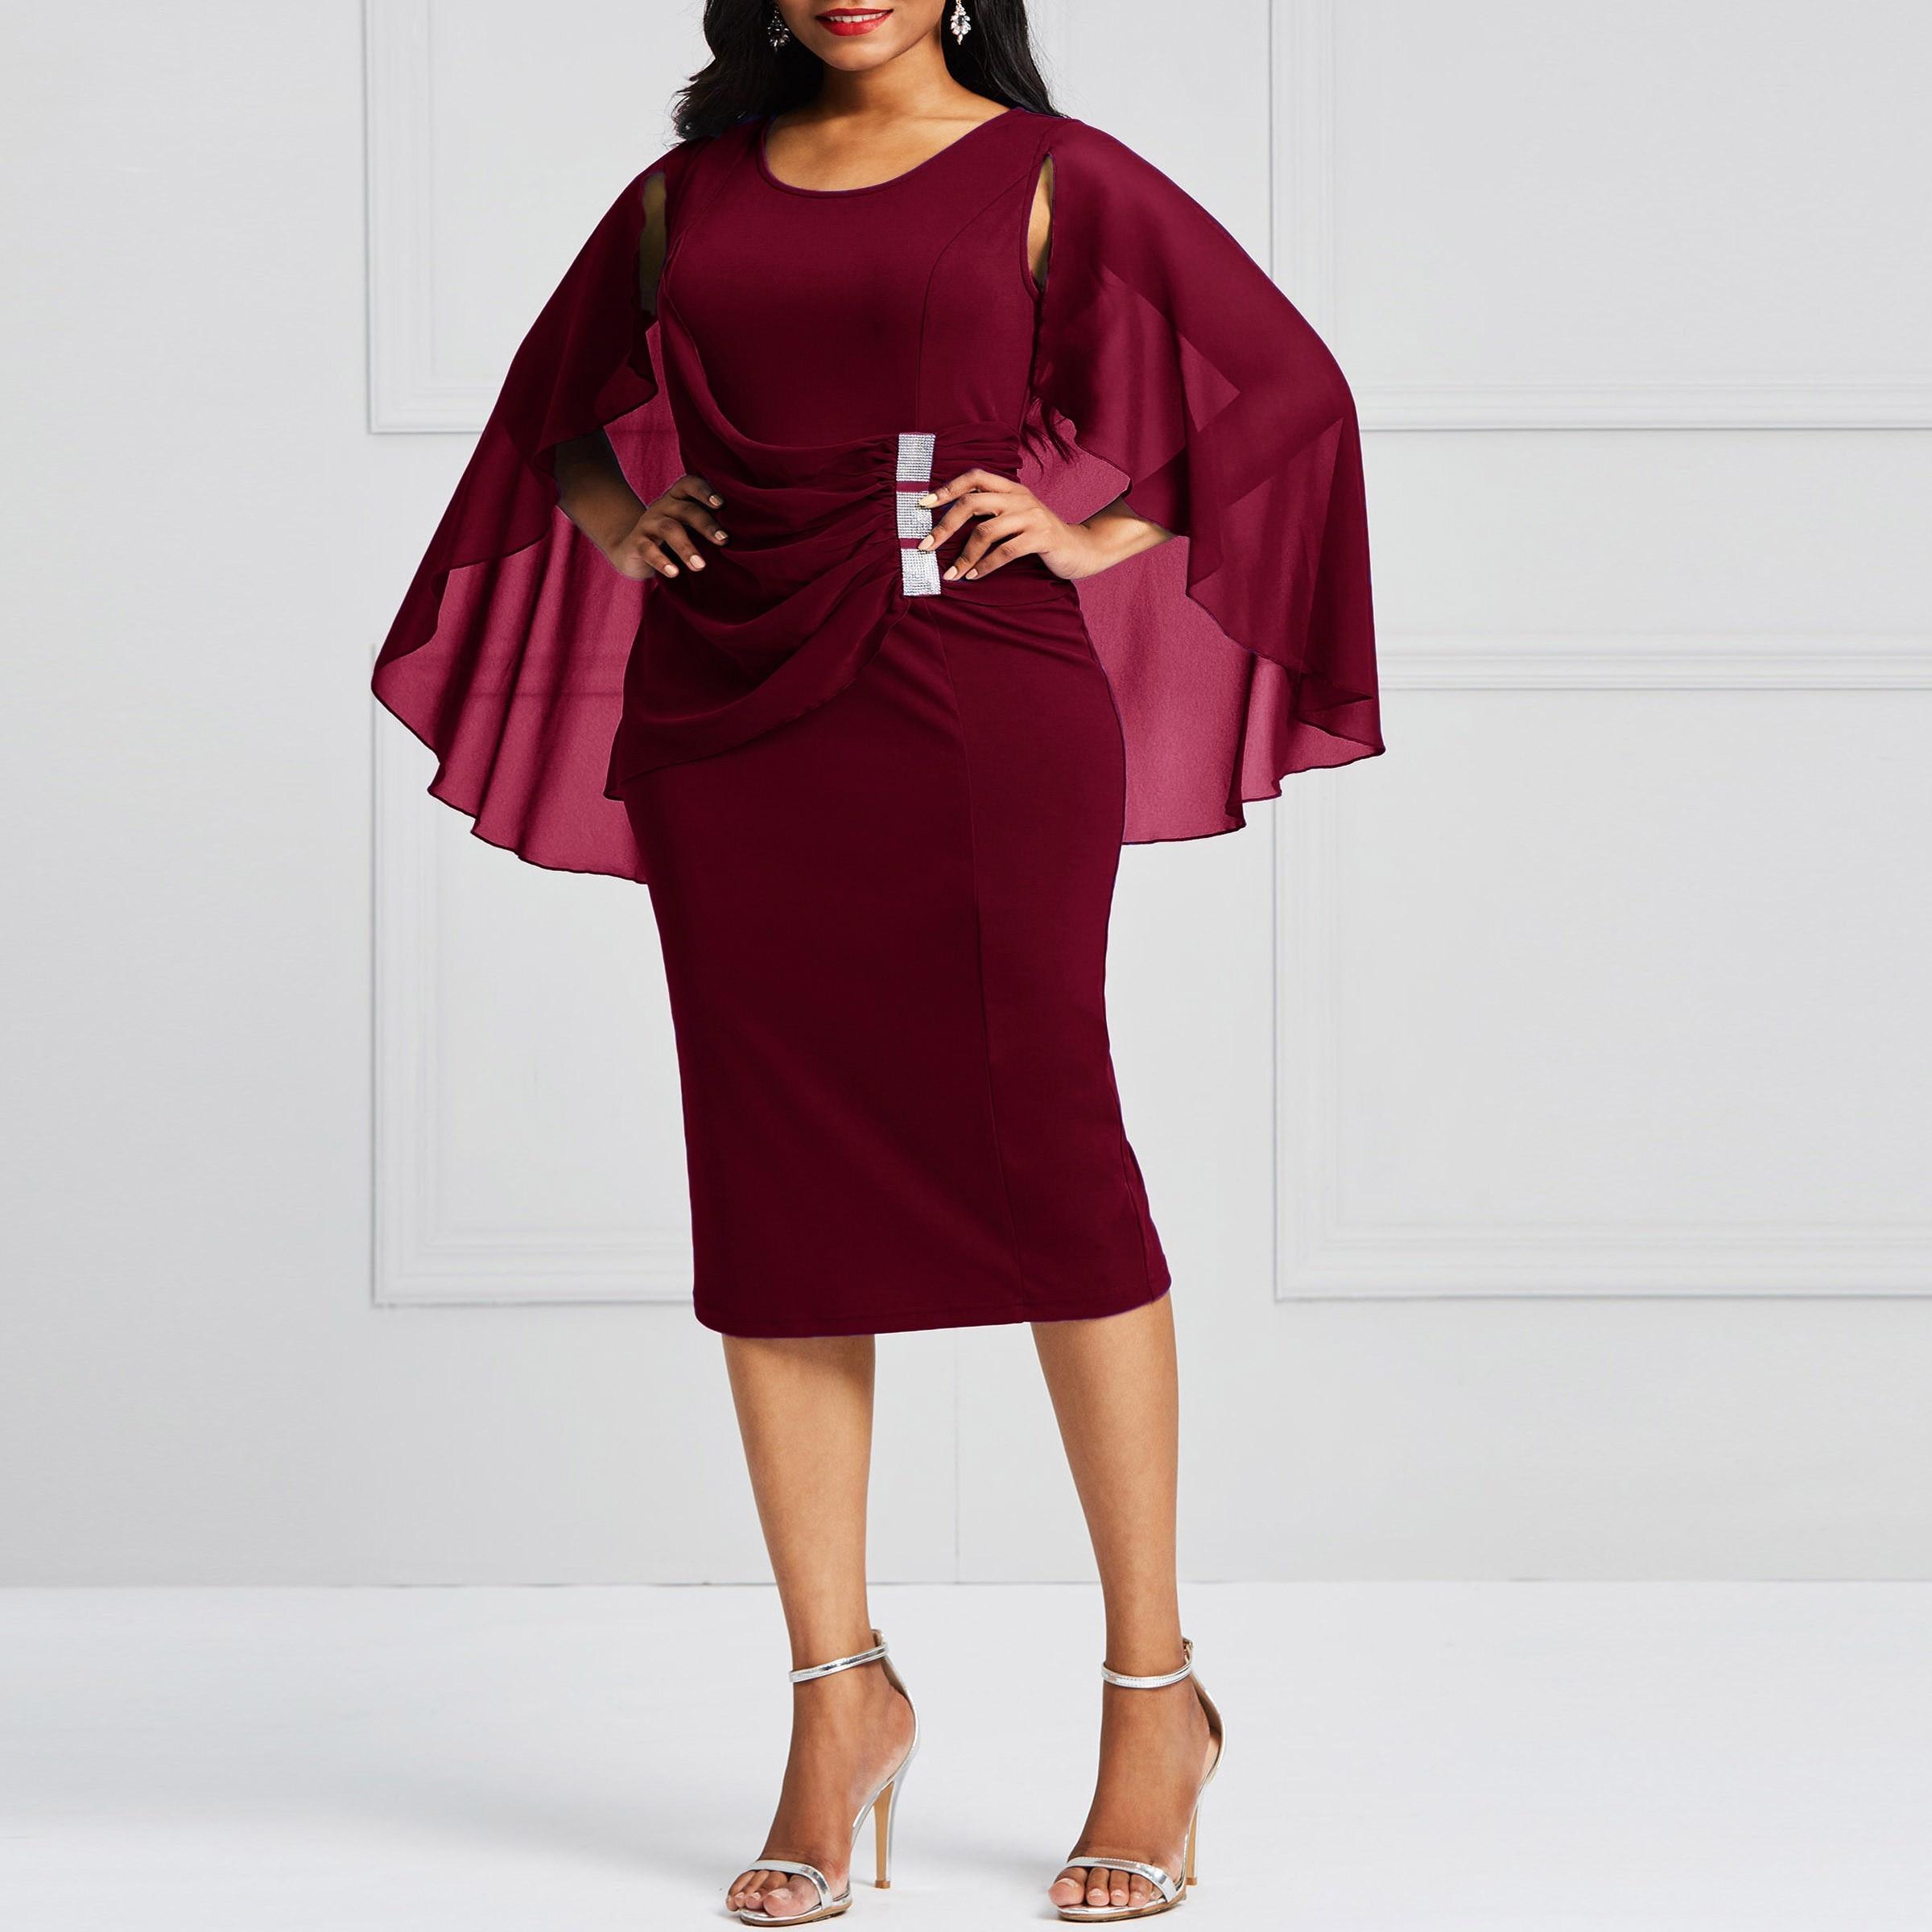 Clocolor Plus Size Autumn Bodycon Batwing Sleeve Pencil Elegant Evening  Fashion Party Pleated Split Midi Ladies Women Dress 2018 06debc78a5b4